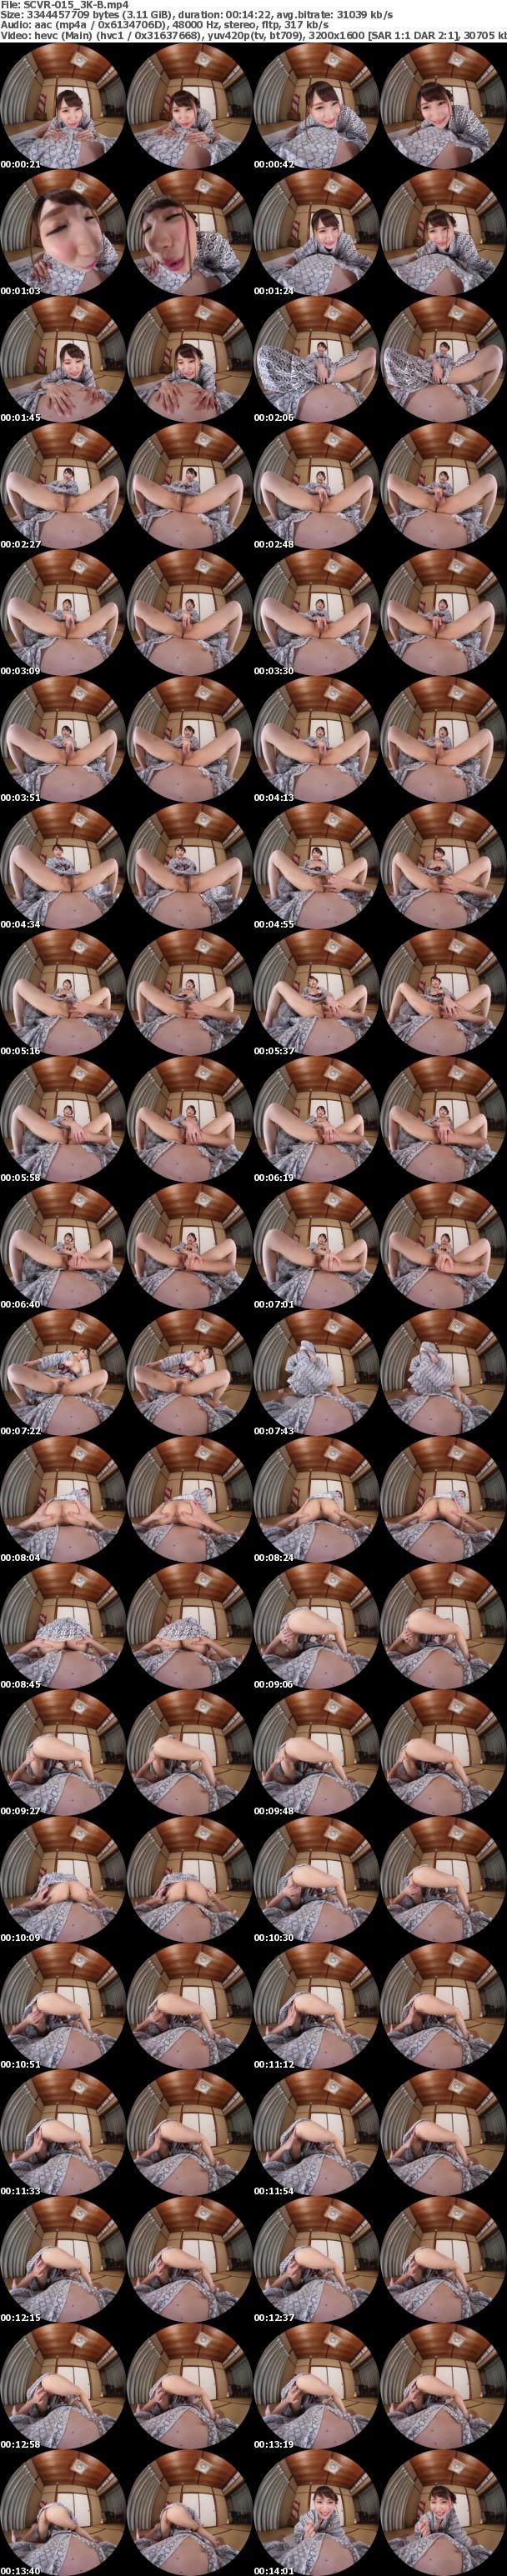 VR/3D KVR1811-10 (SCVR-015) 【匠】温泉で勃起見せつけ!!欲求不満な爆乳人妻が勃起ち●ぽに欲情してそのまま風呂場で声我慢セックス!!その後、部屋を訪れてきて、濃厚濃密連続中出し!!